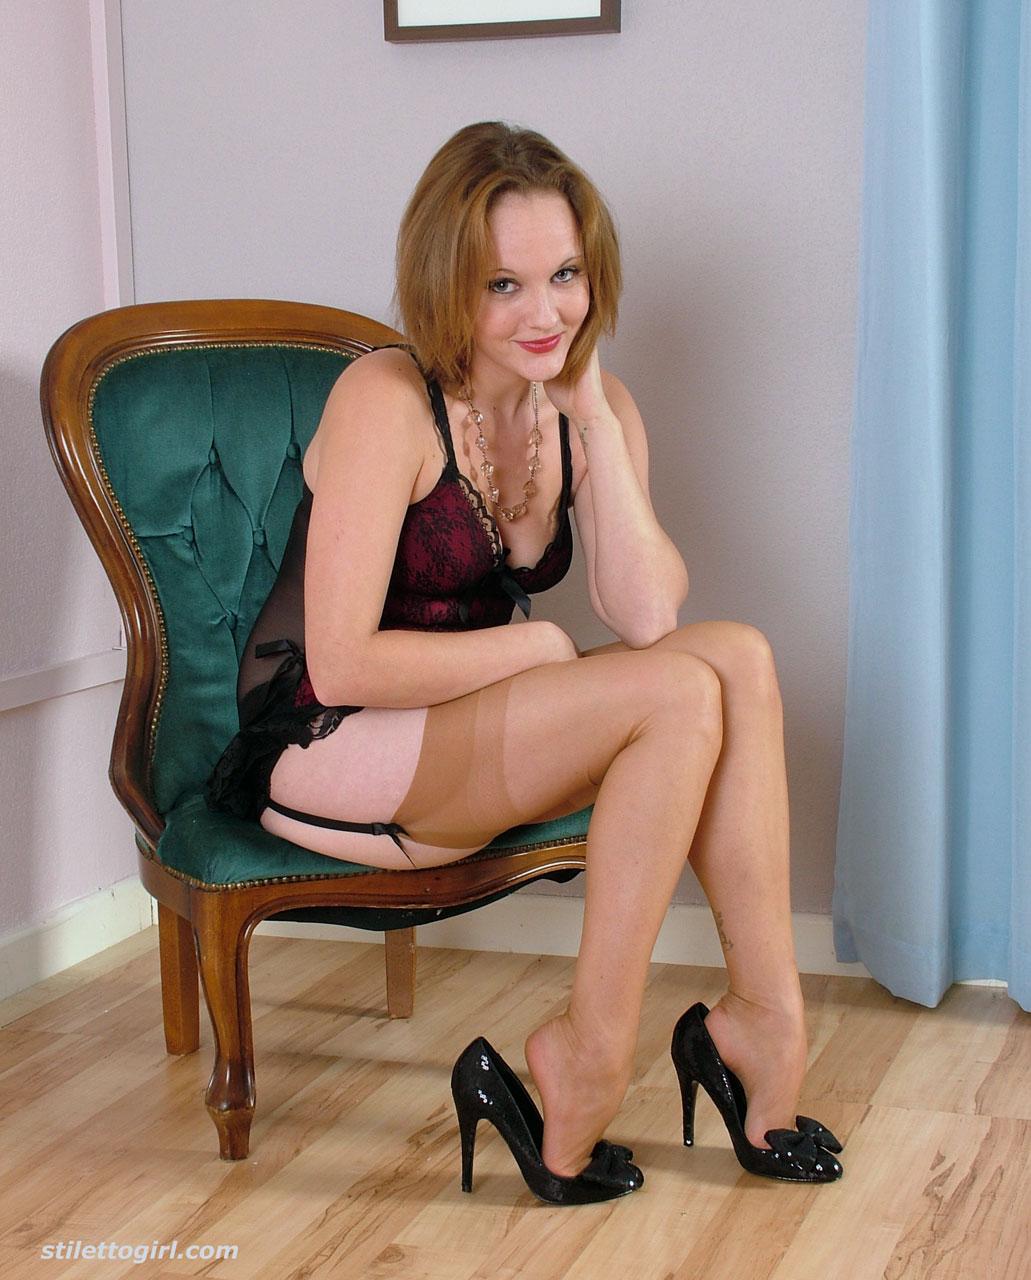 Large nude women videos-8453